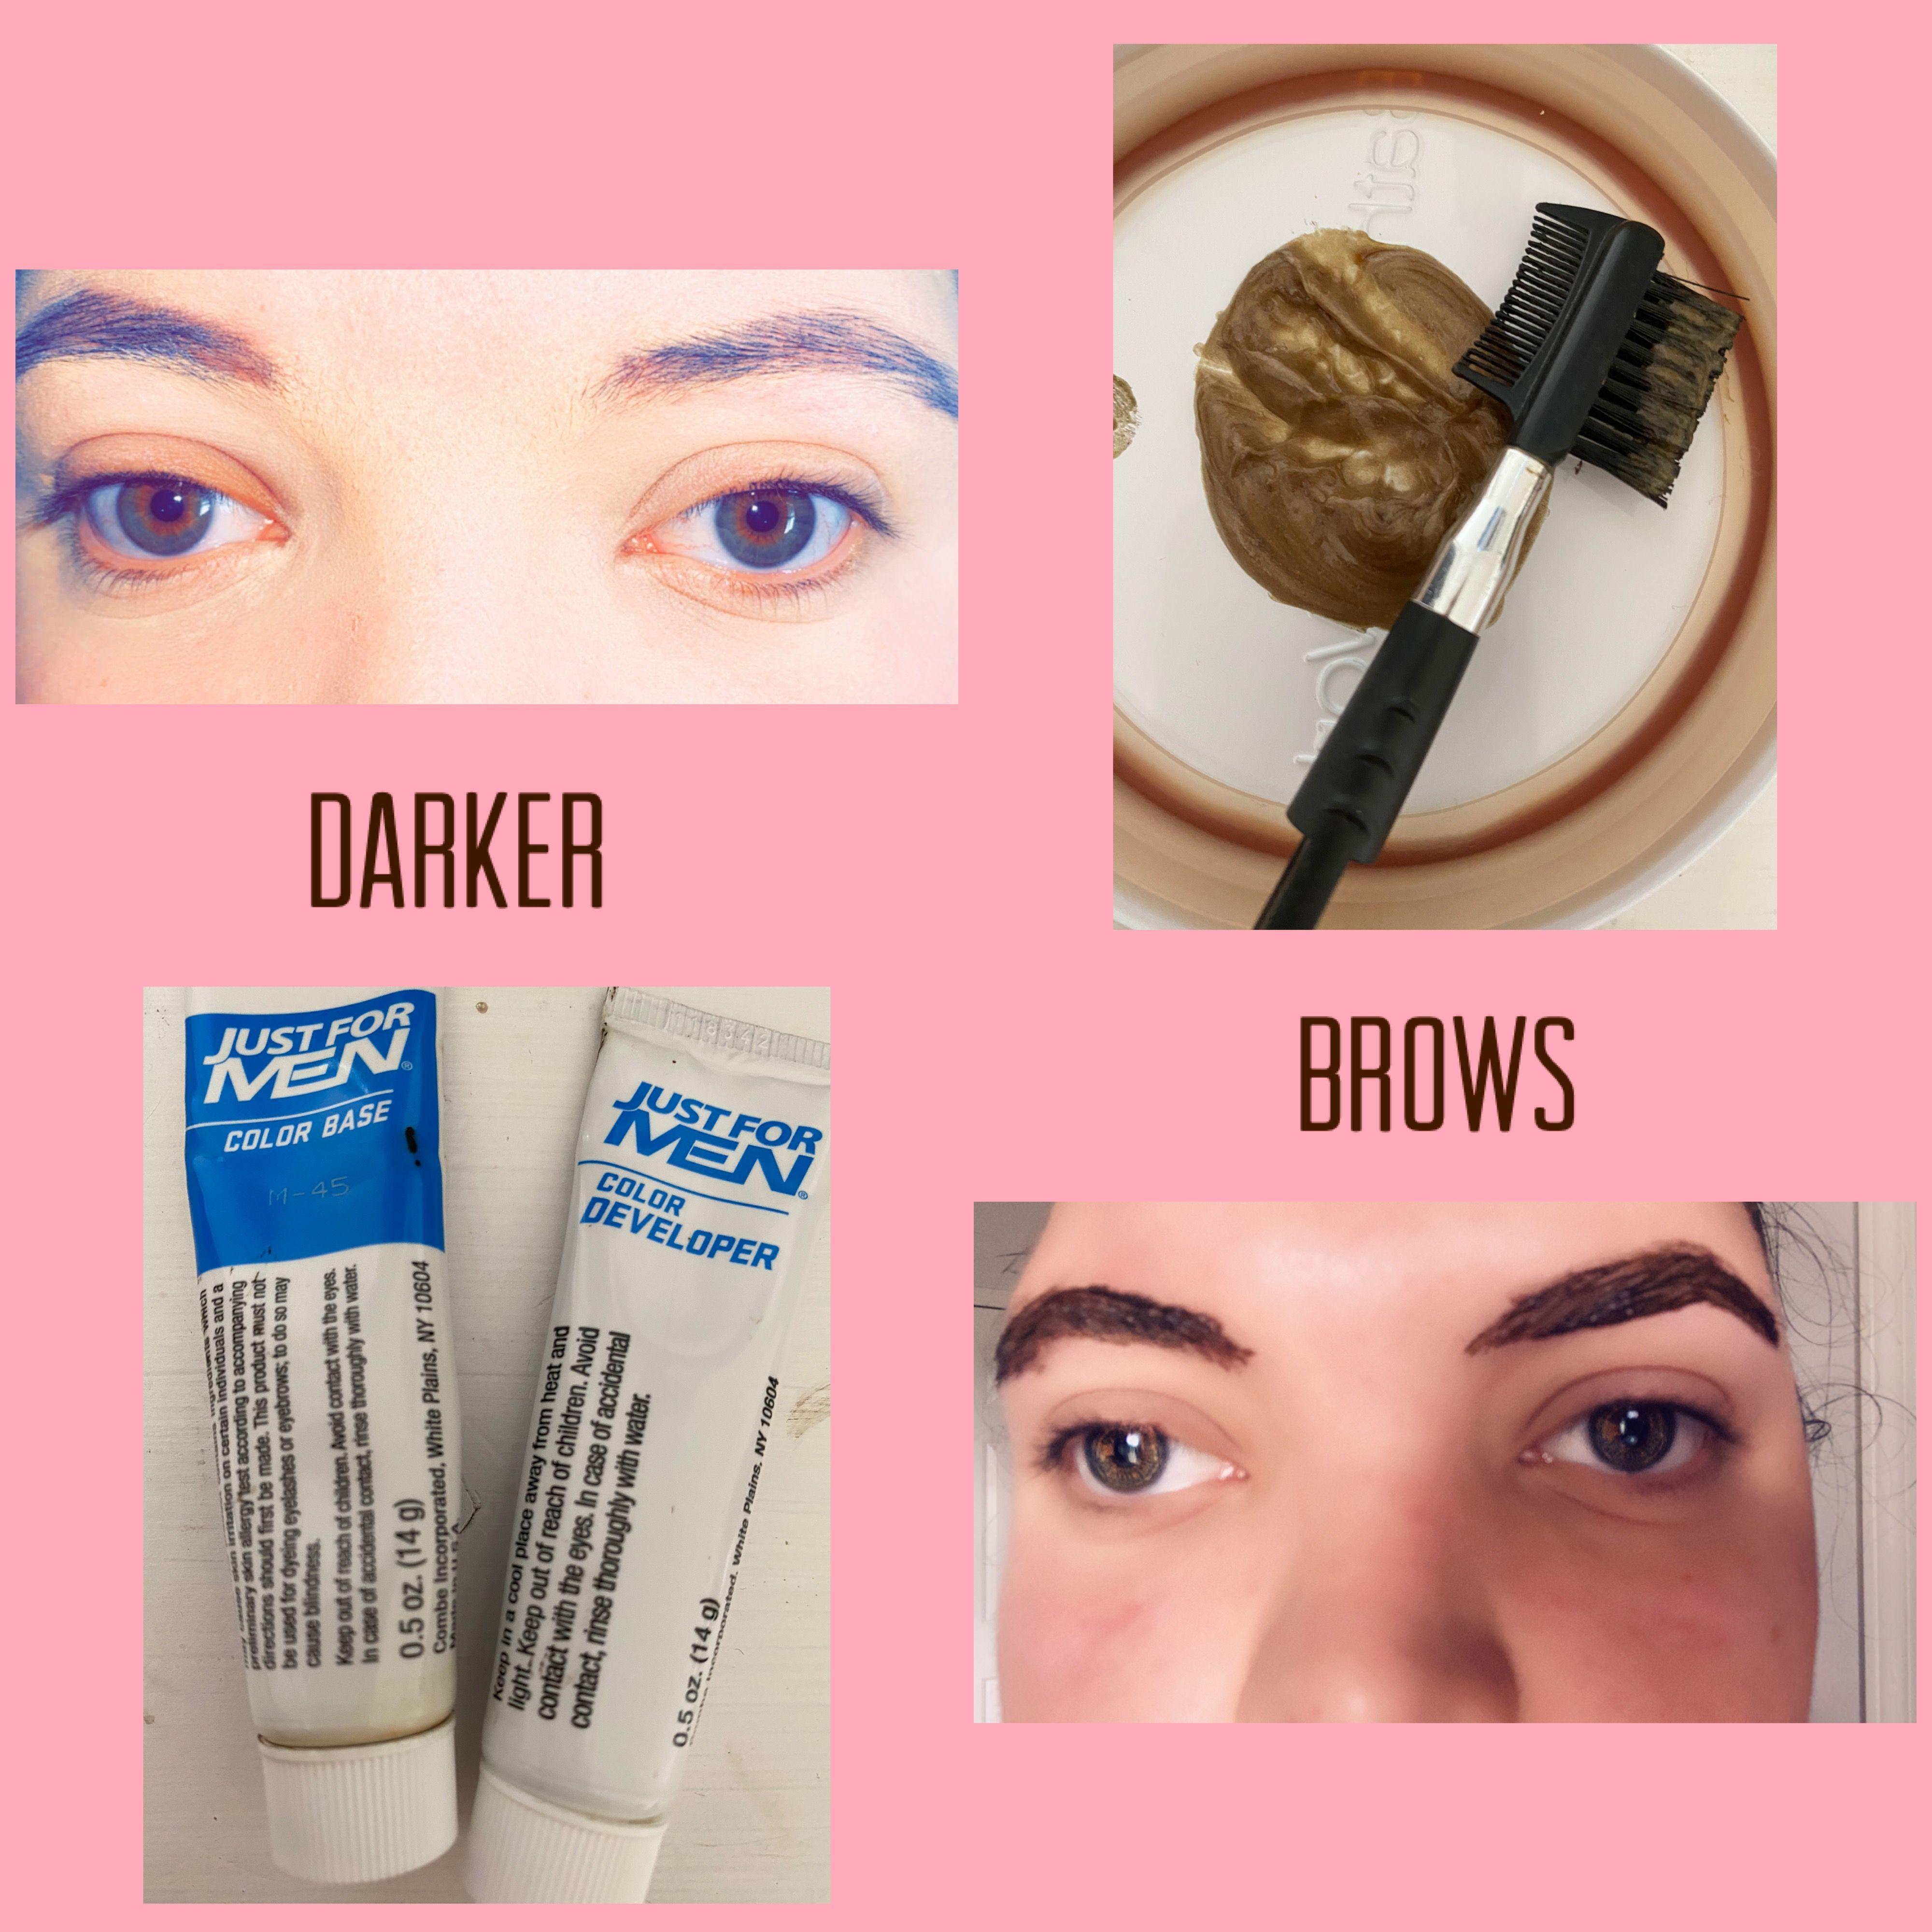 Darker Brows In 2020 Dark Brows Dark Eyebrows Just For Men